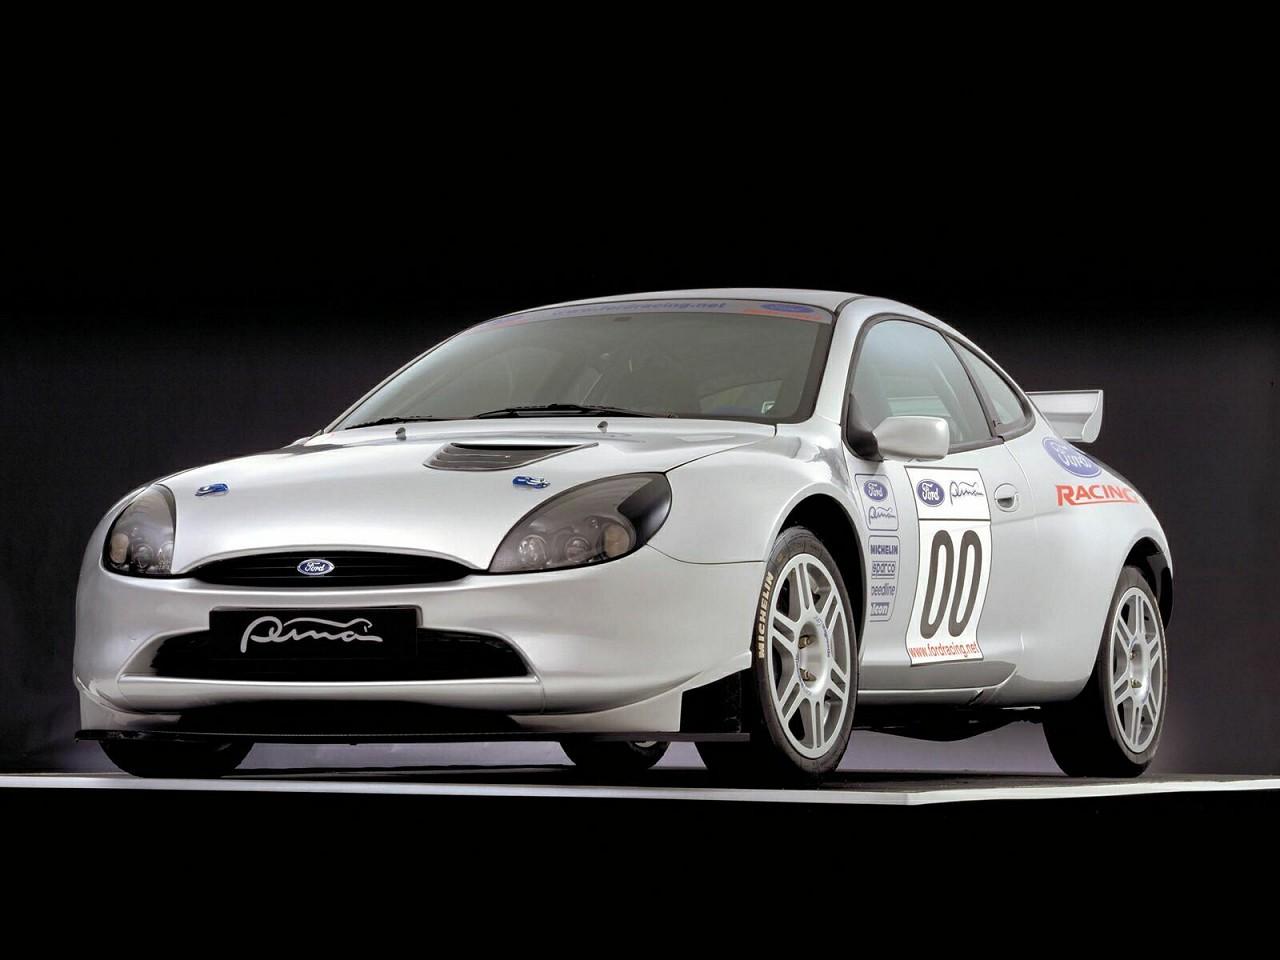 Semuamuat The Amazing Of Ford Racing Puma